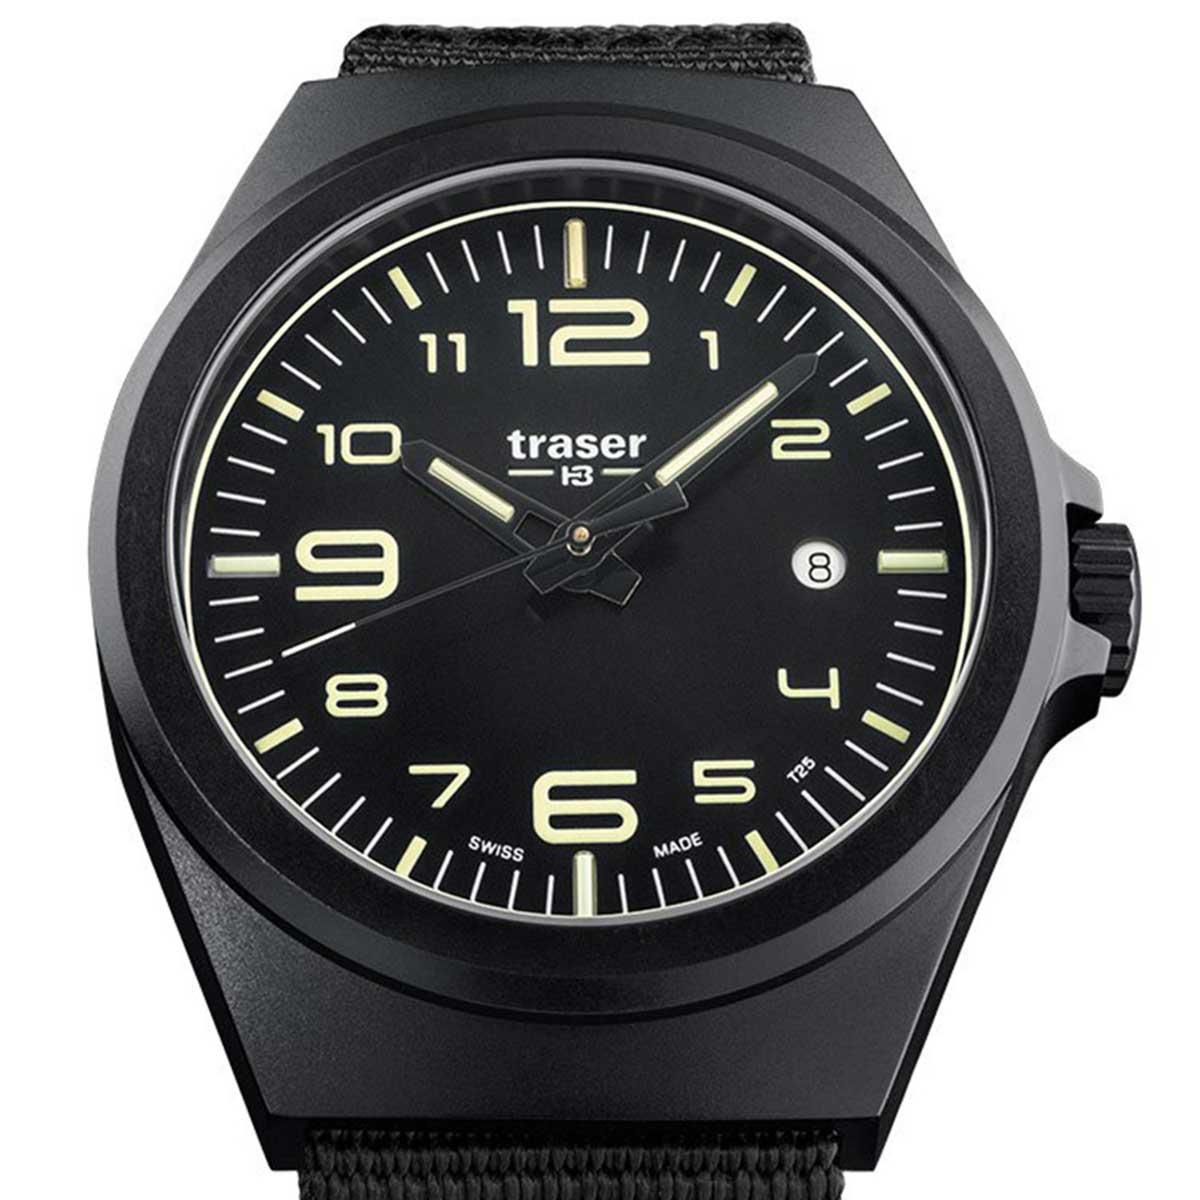 traser トレーサー 電池式クォーツ 腕時計 [P59-108218] 並行輸入品 夜光表記(Trigalight トリガライト)